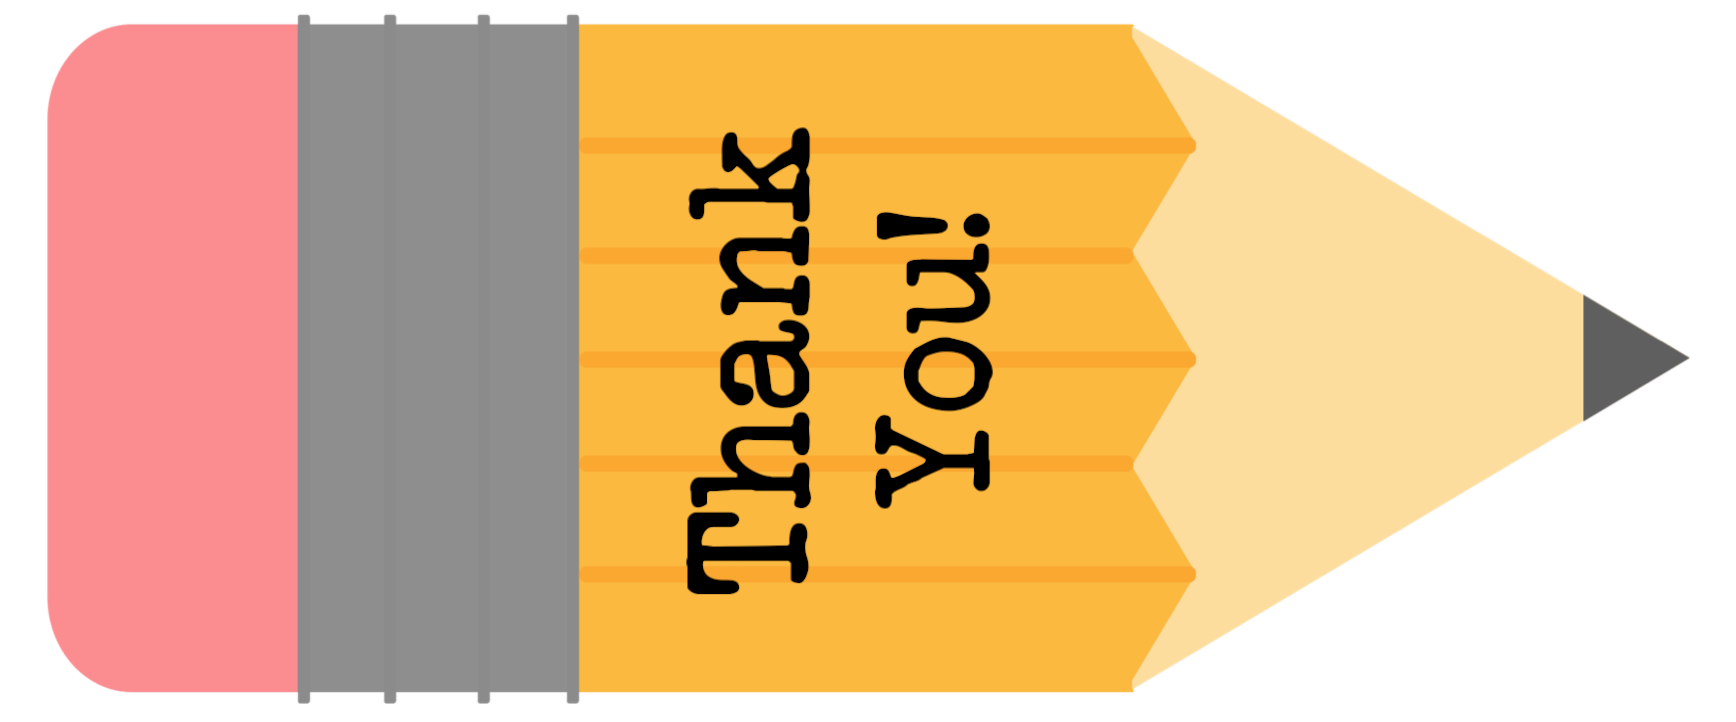 1 teacher free printable pencil gift tag